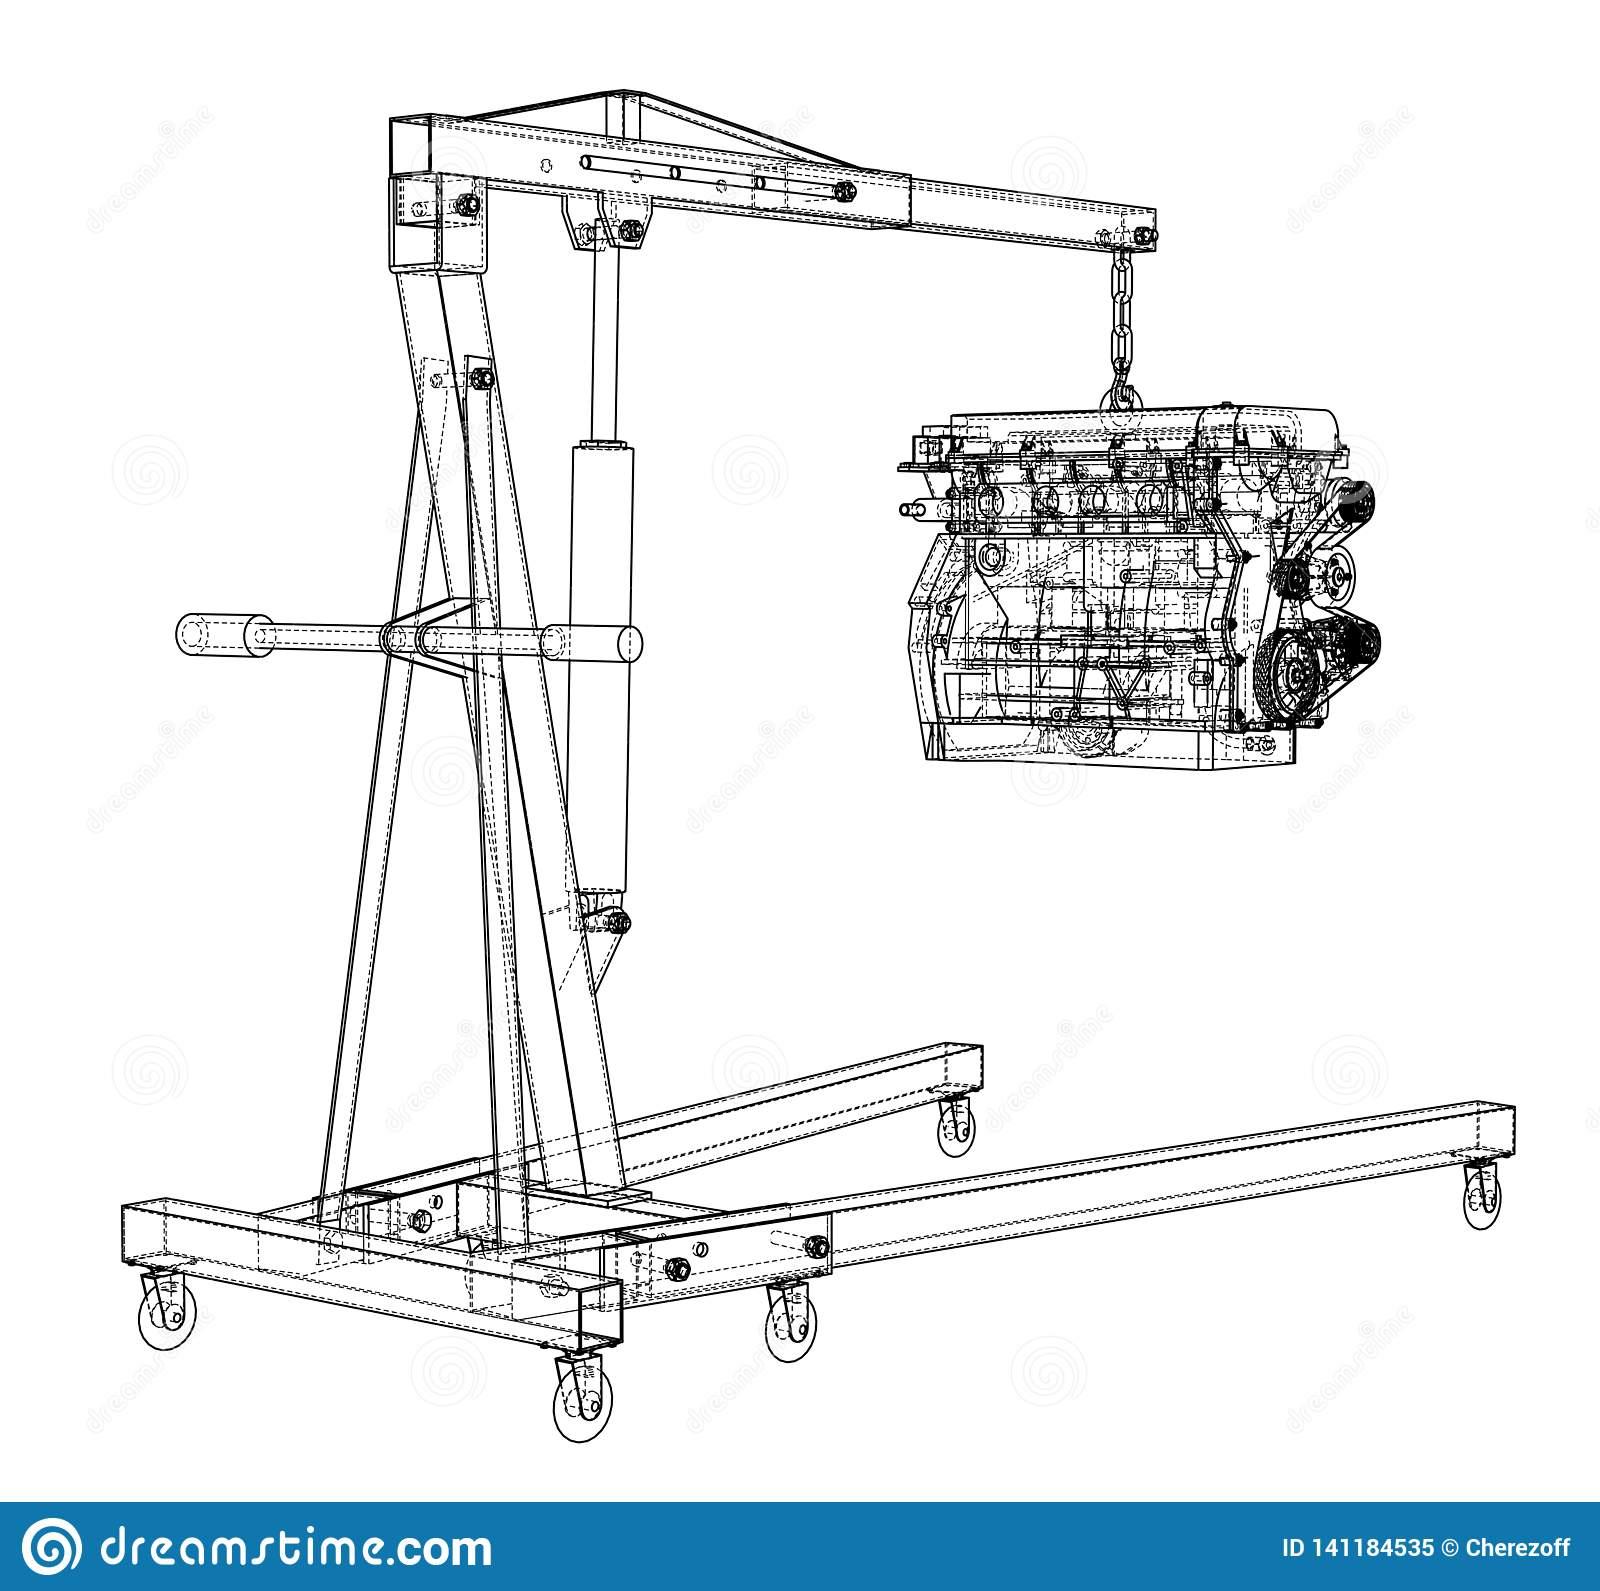 Mz 9409  Body Force Diagrams Engine Hoist Download Diagram